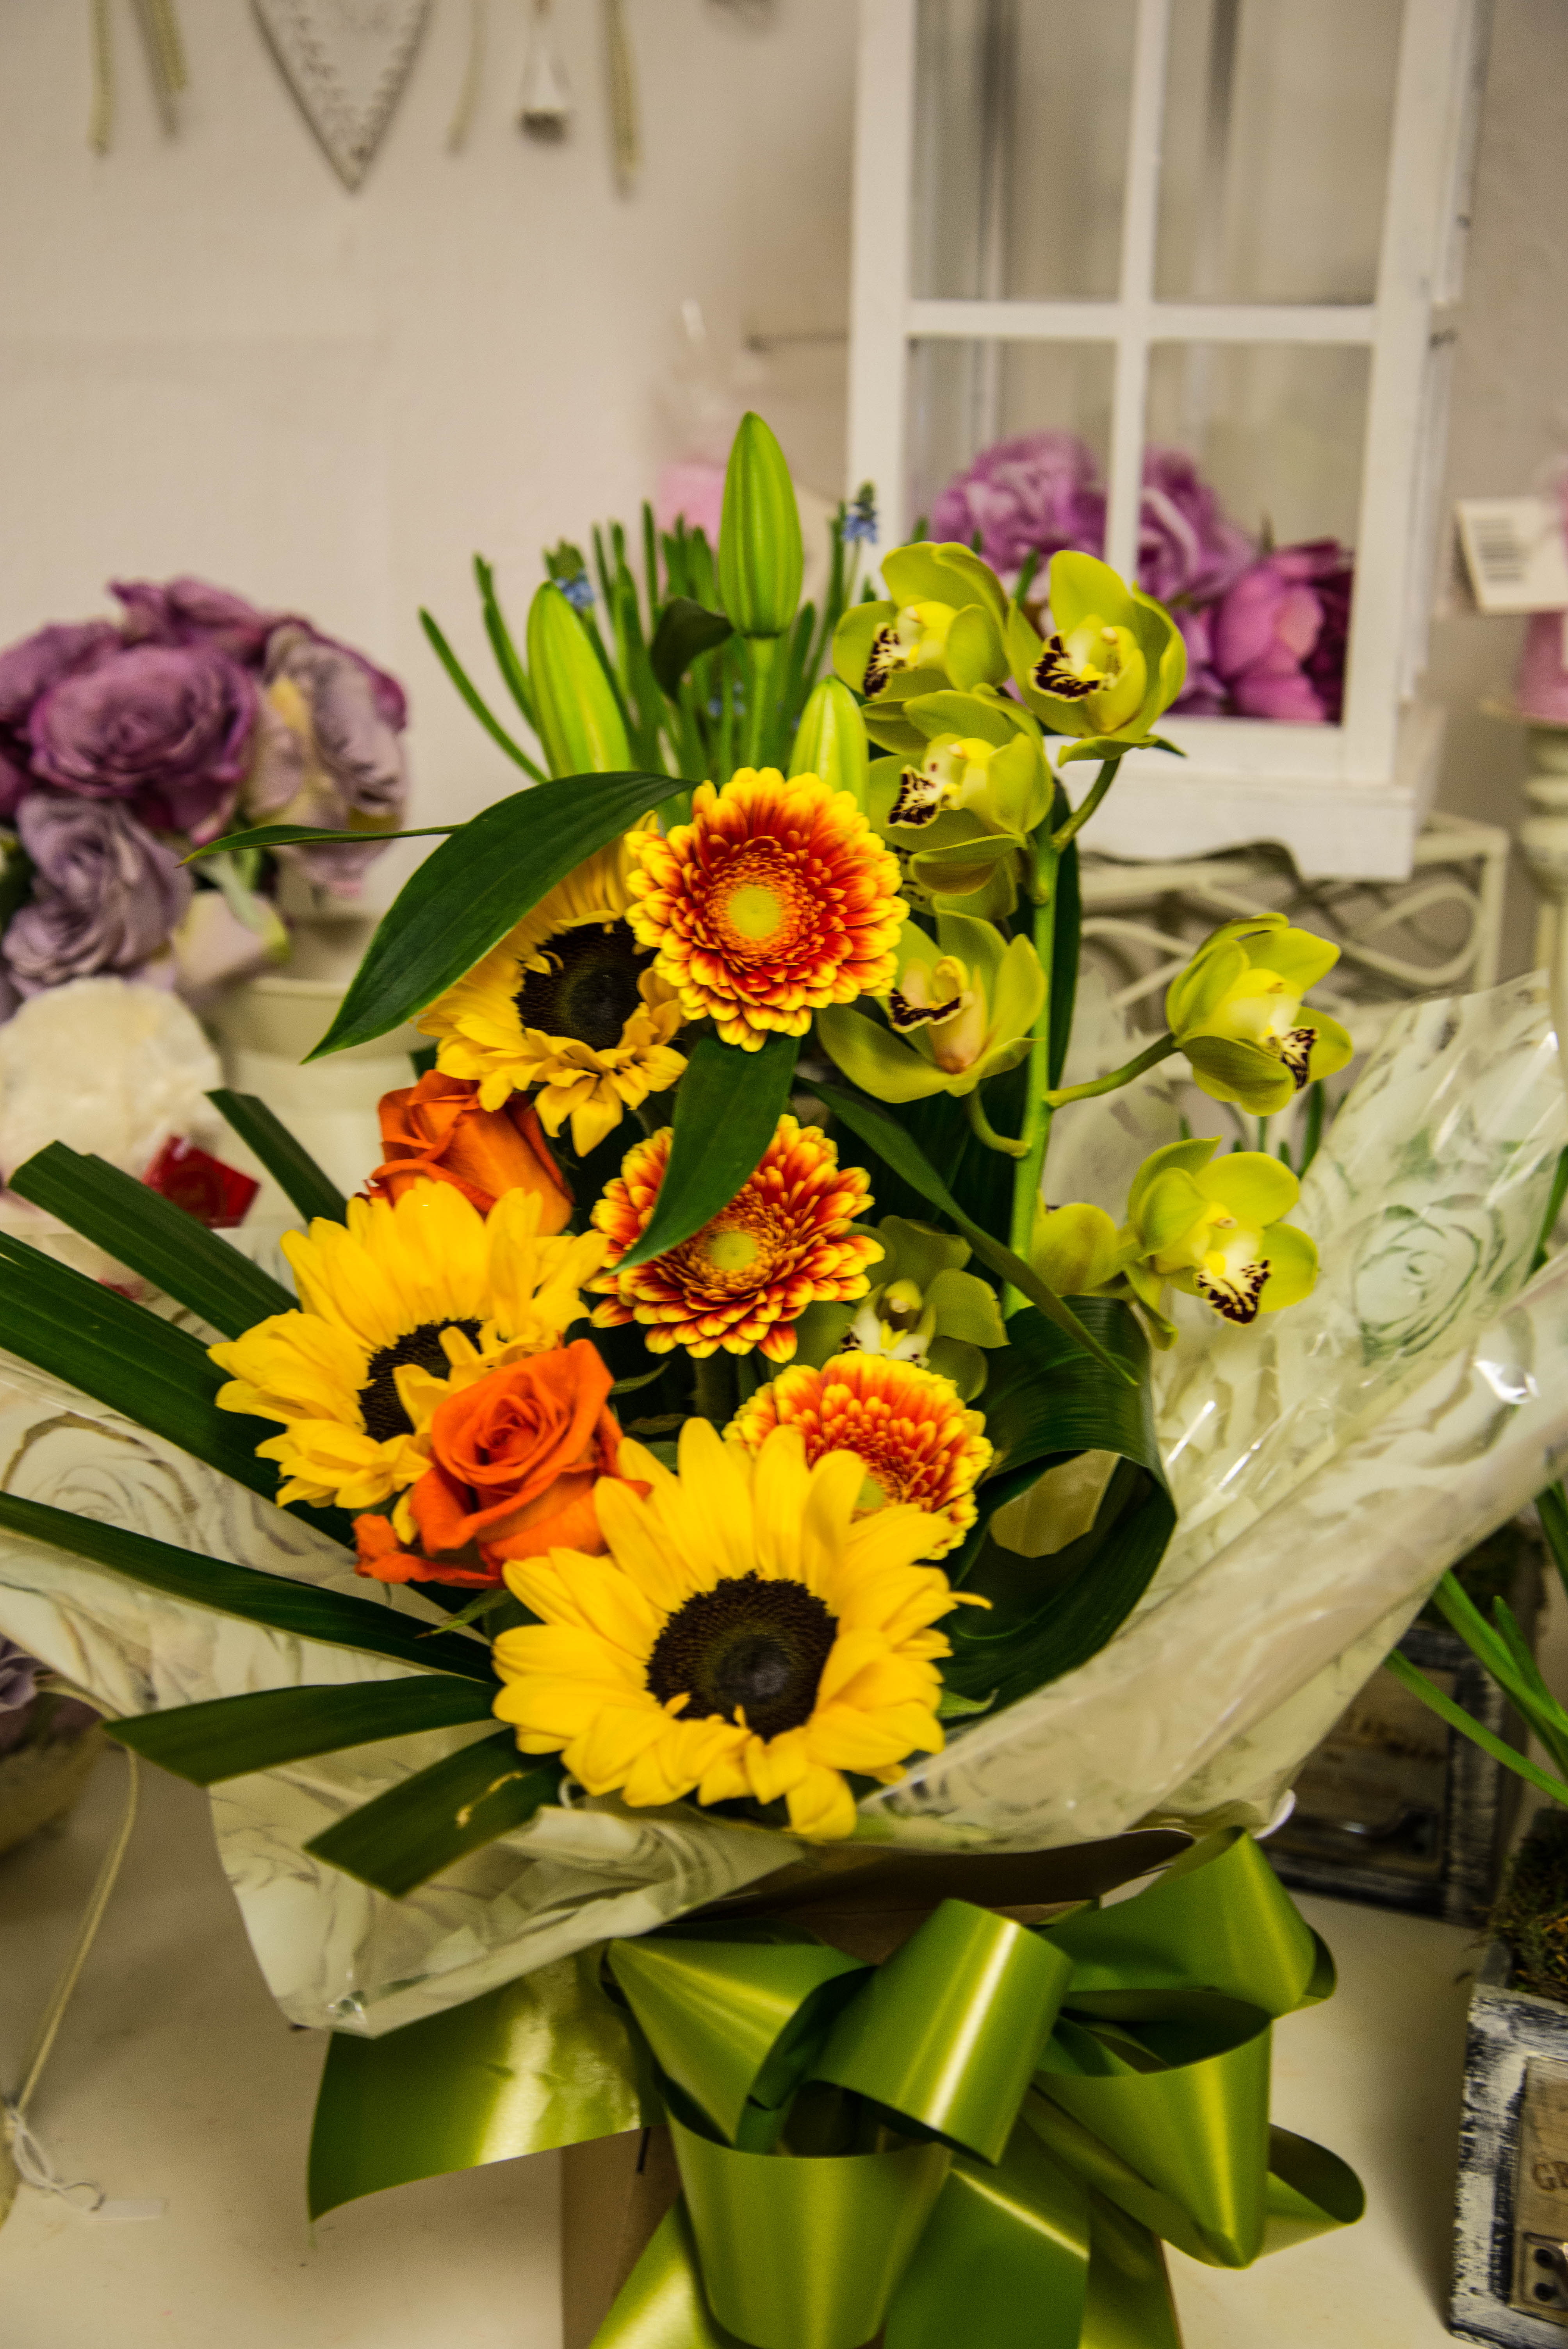 Sending a Bouquet of Flowers